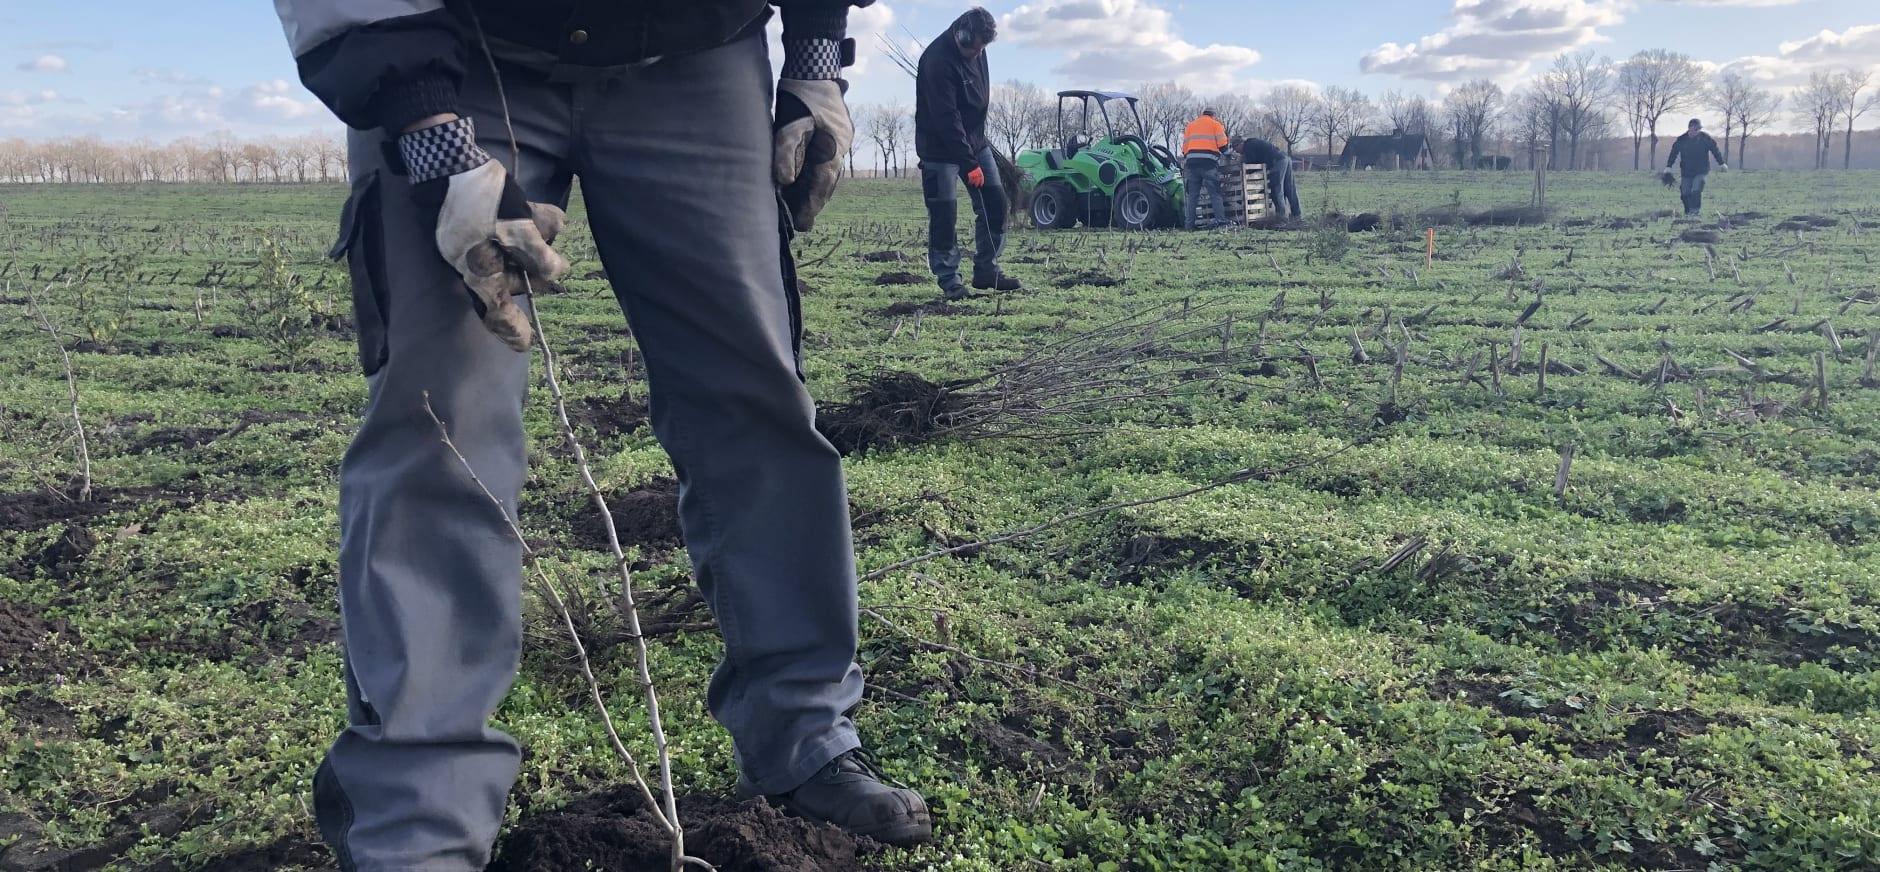 start bosaanplant Weert - feb 2021